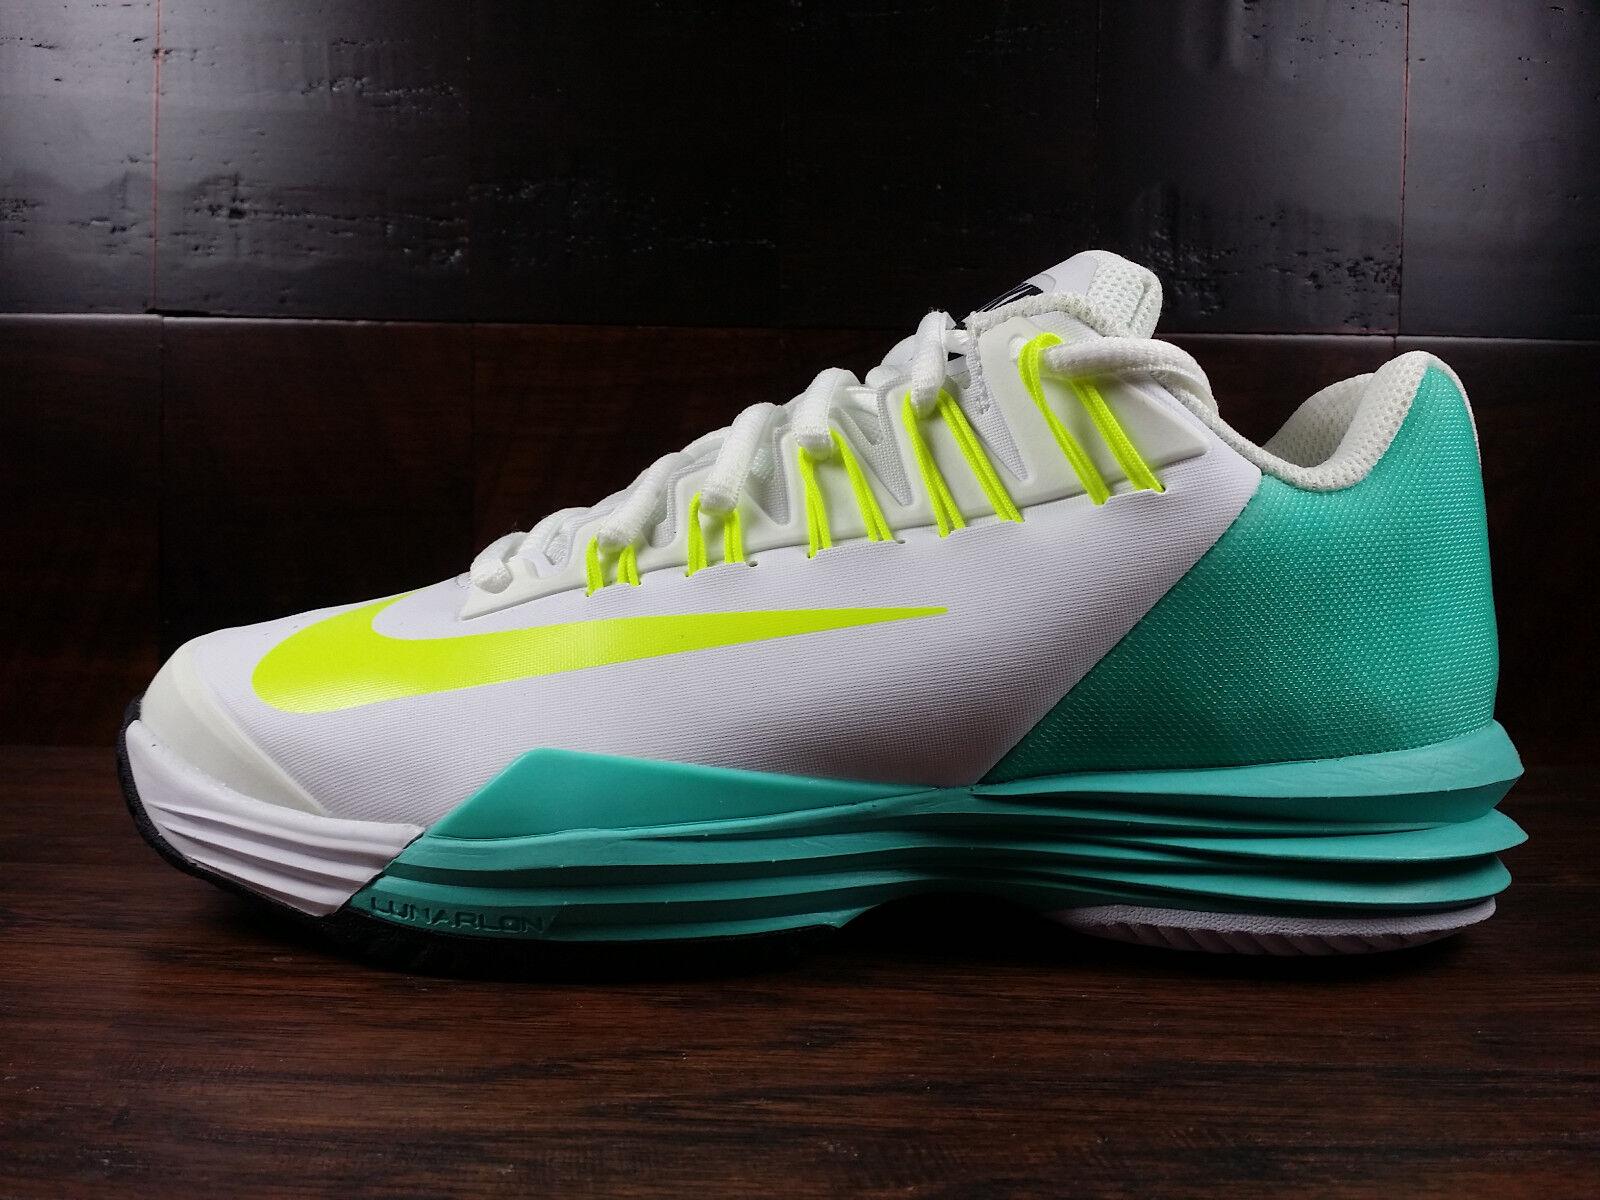 Nike ballistec lunare (bianco / volt / hyperturq), tennis (631648-173] wmns sz 6 - 10